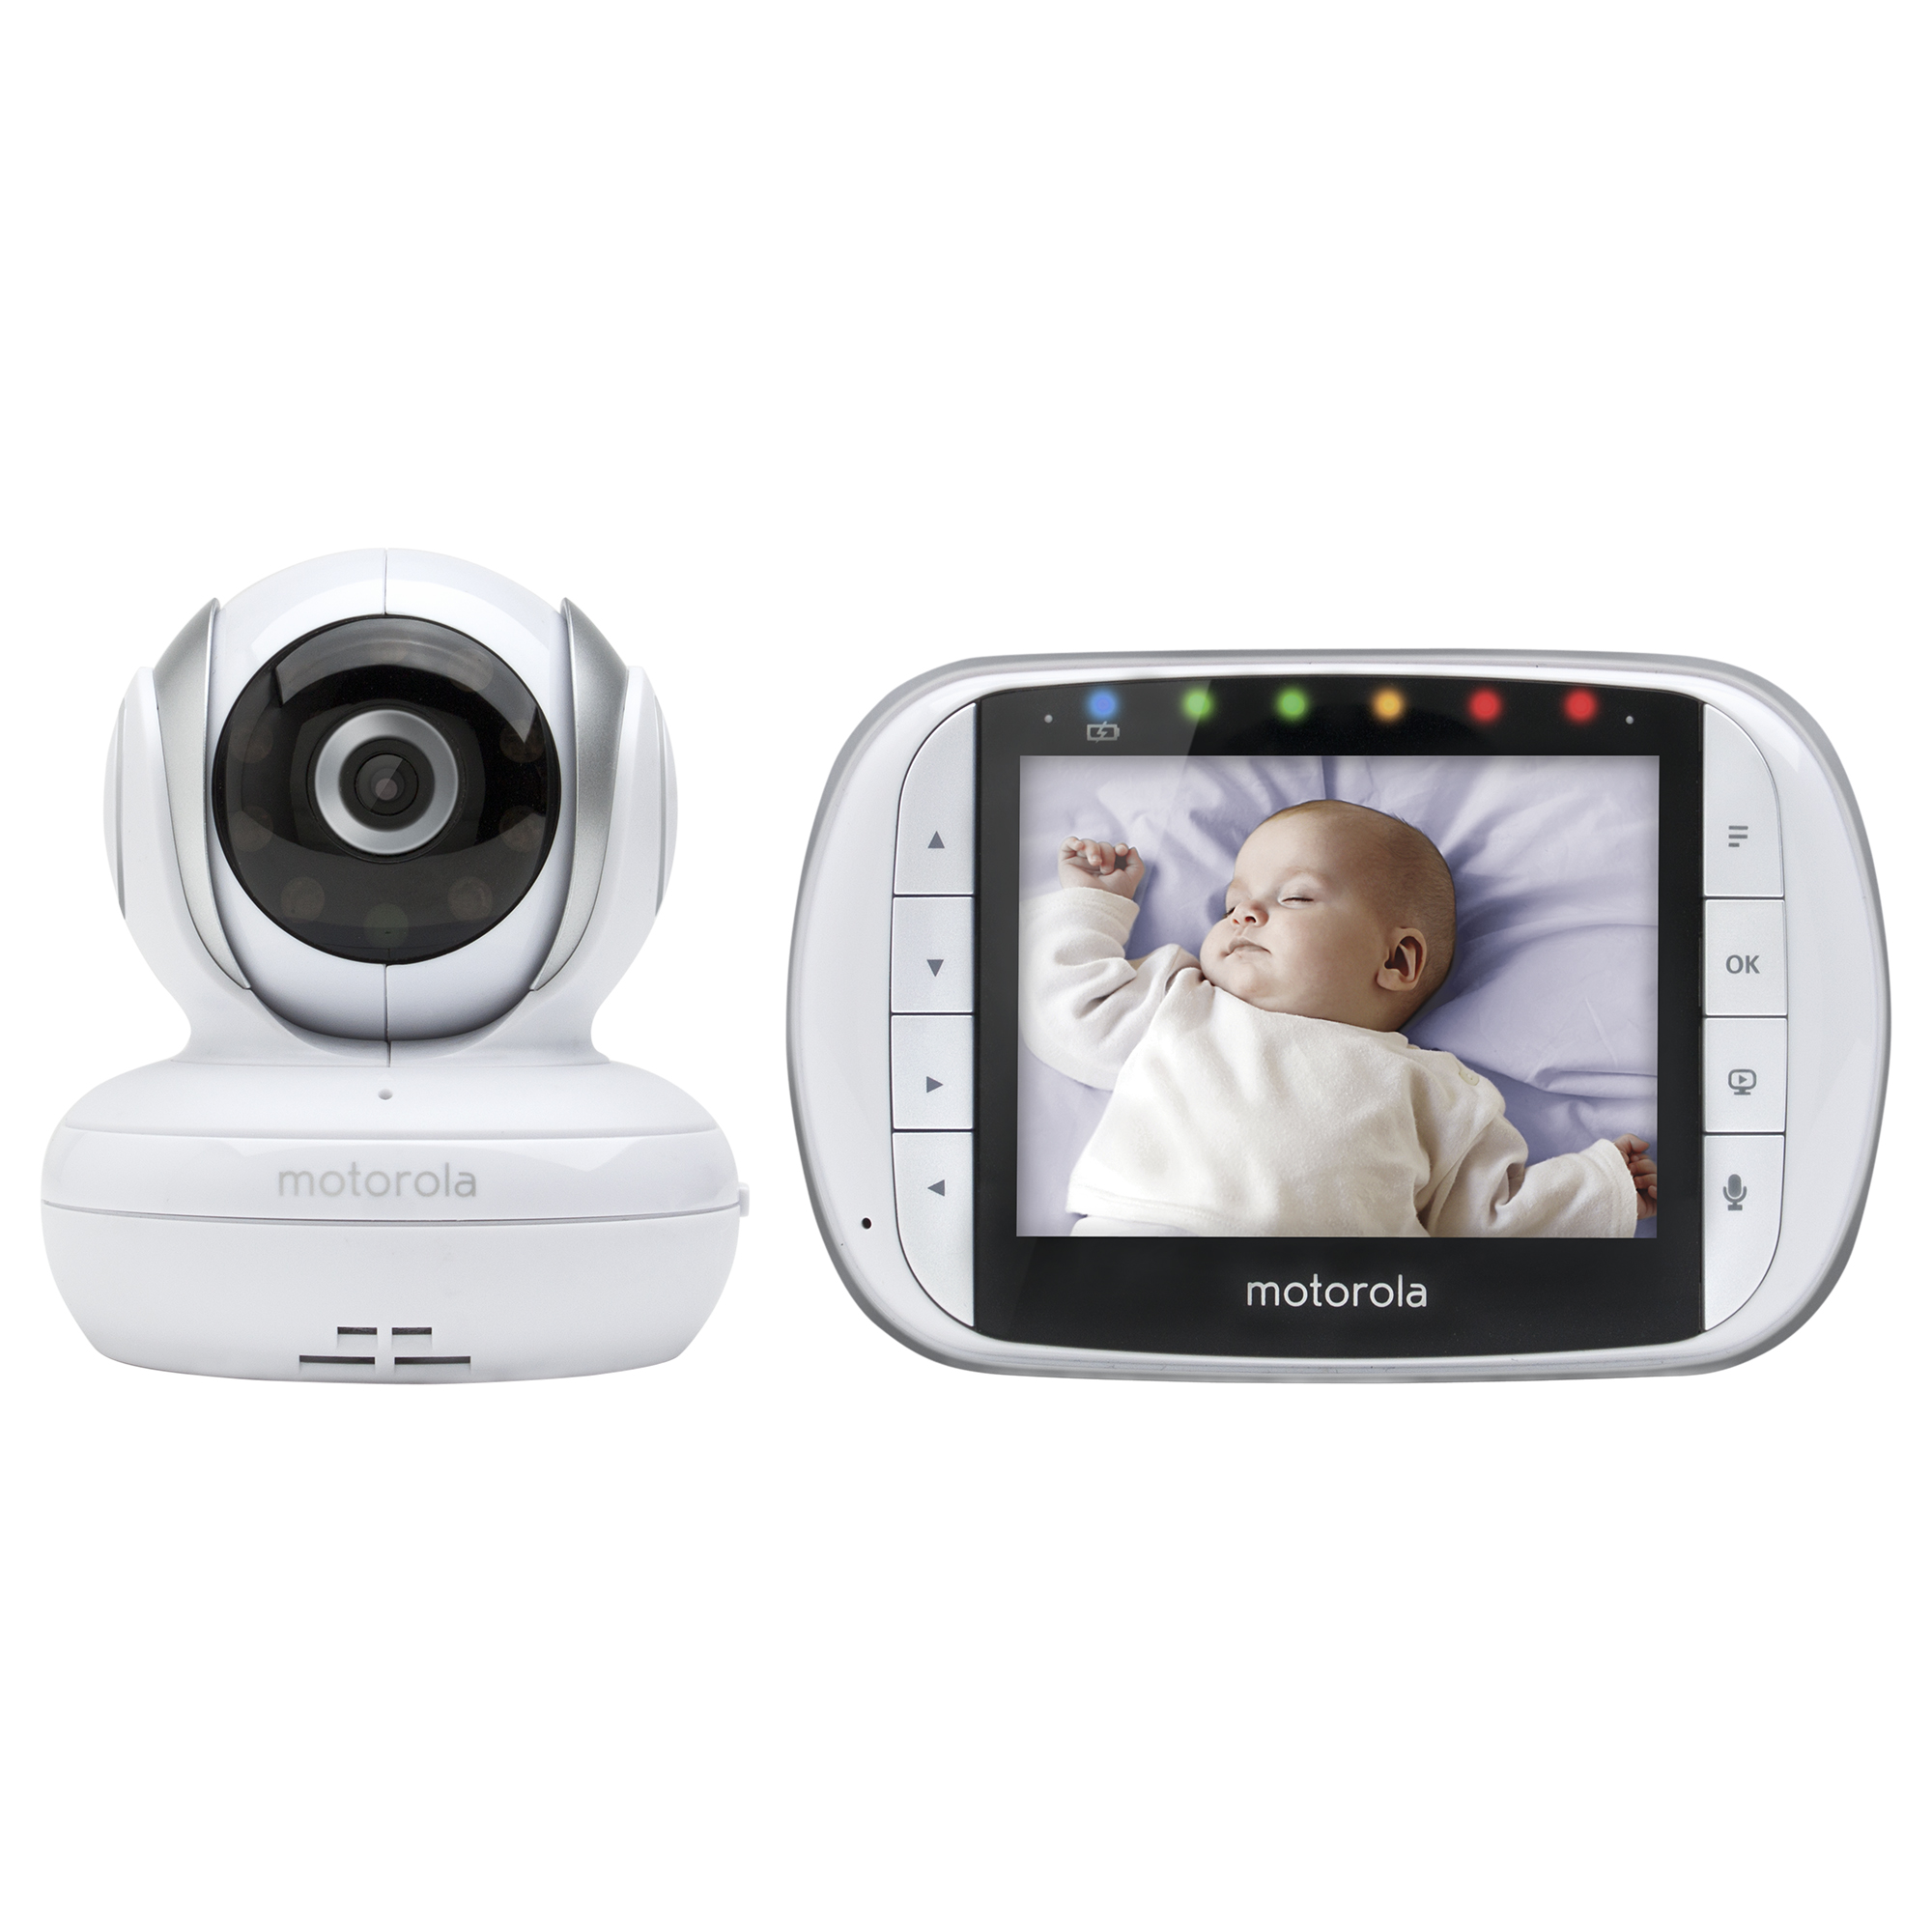 "Motorola MBP33XL, Video Baby Monitor, 3.5"" Monitor by Motorola"